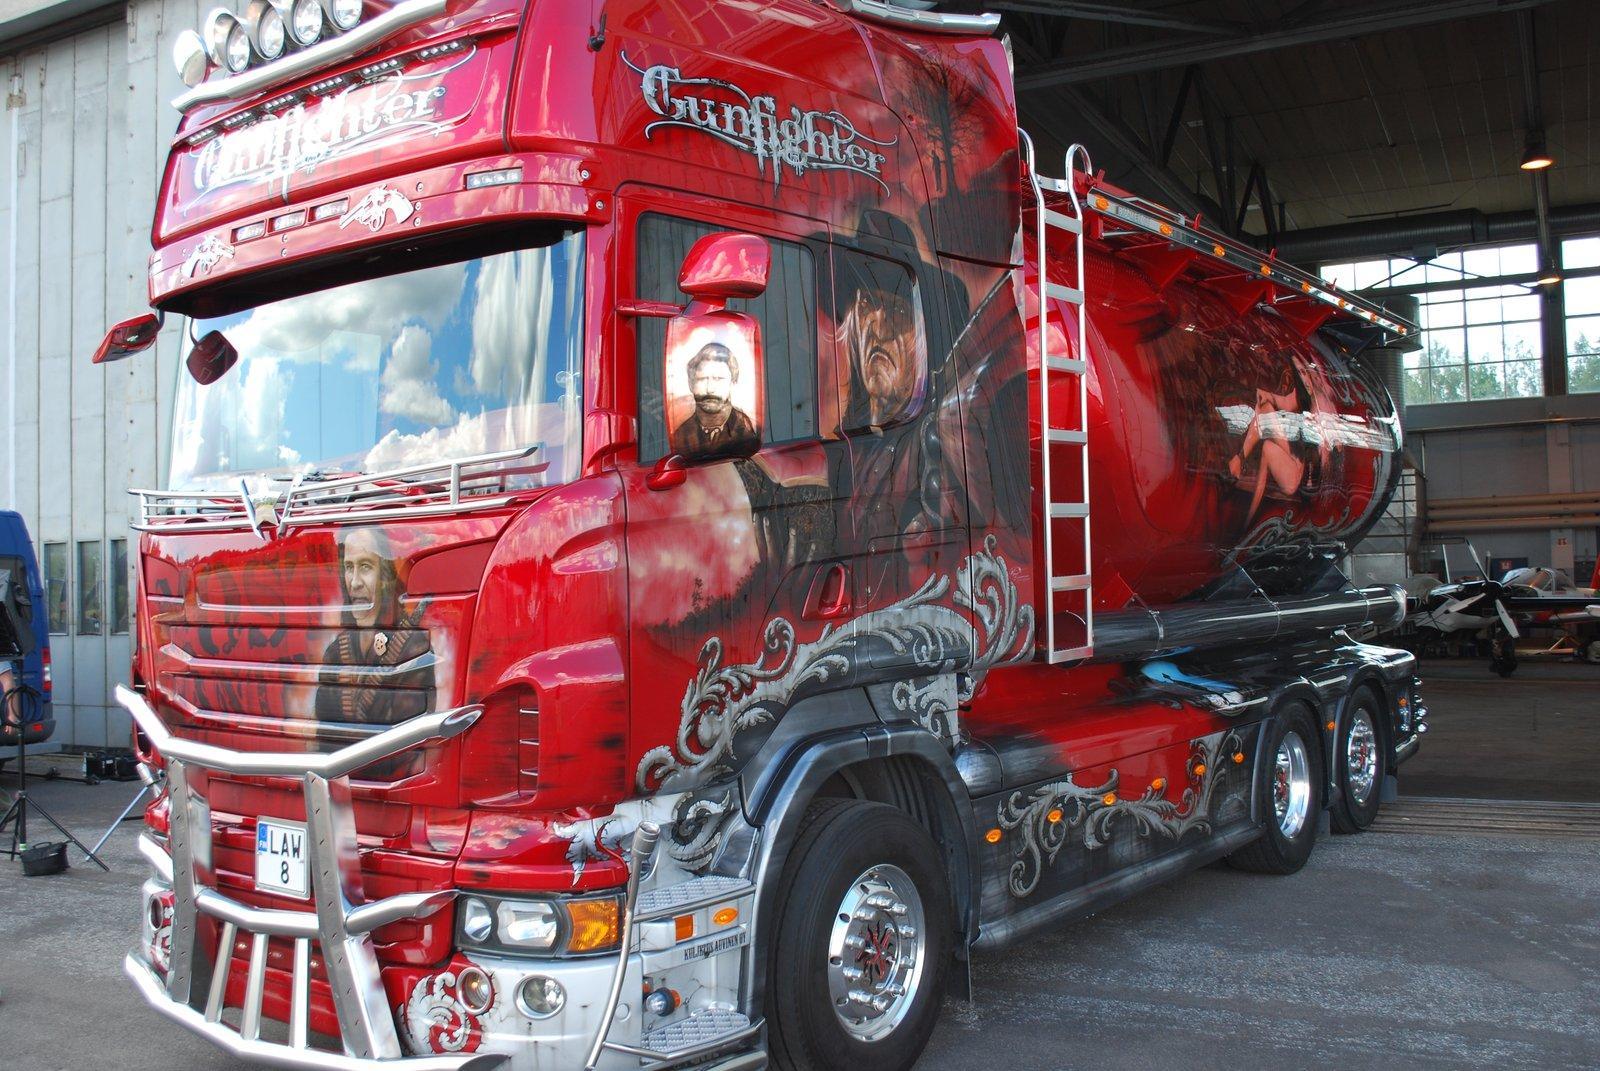 Секс в грузовиках фото 10 фотография